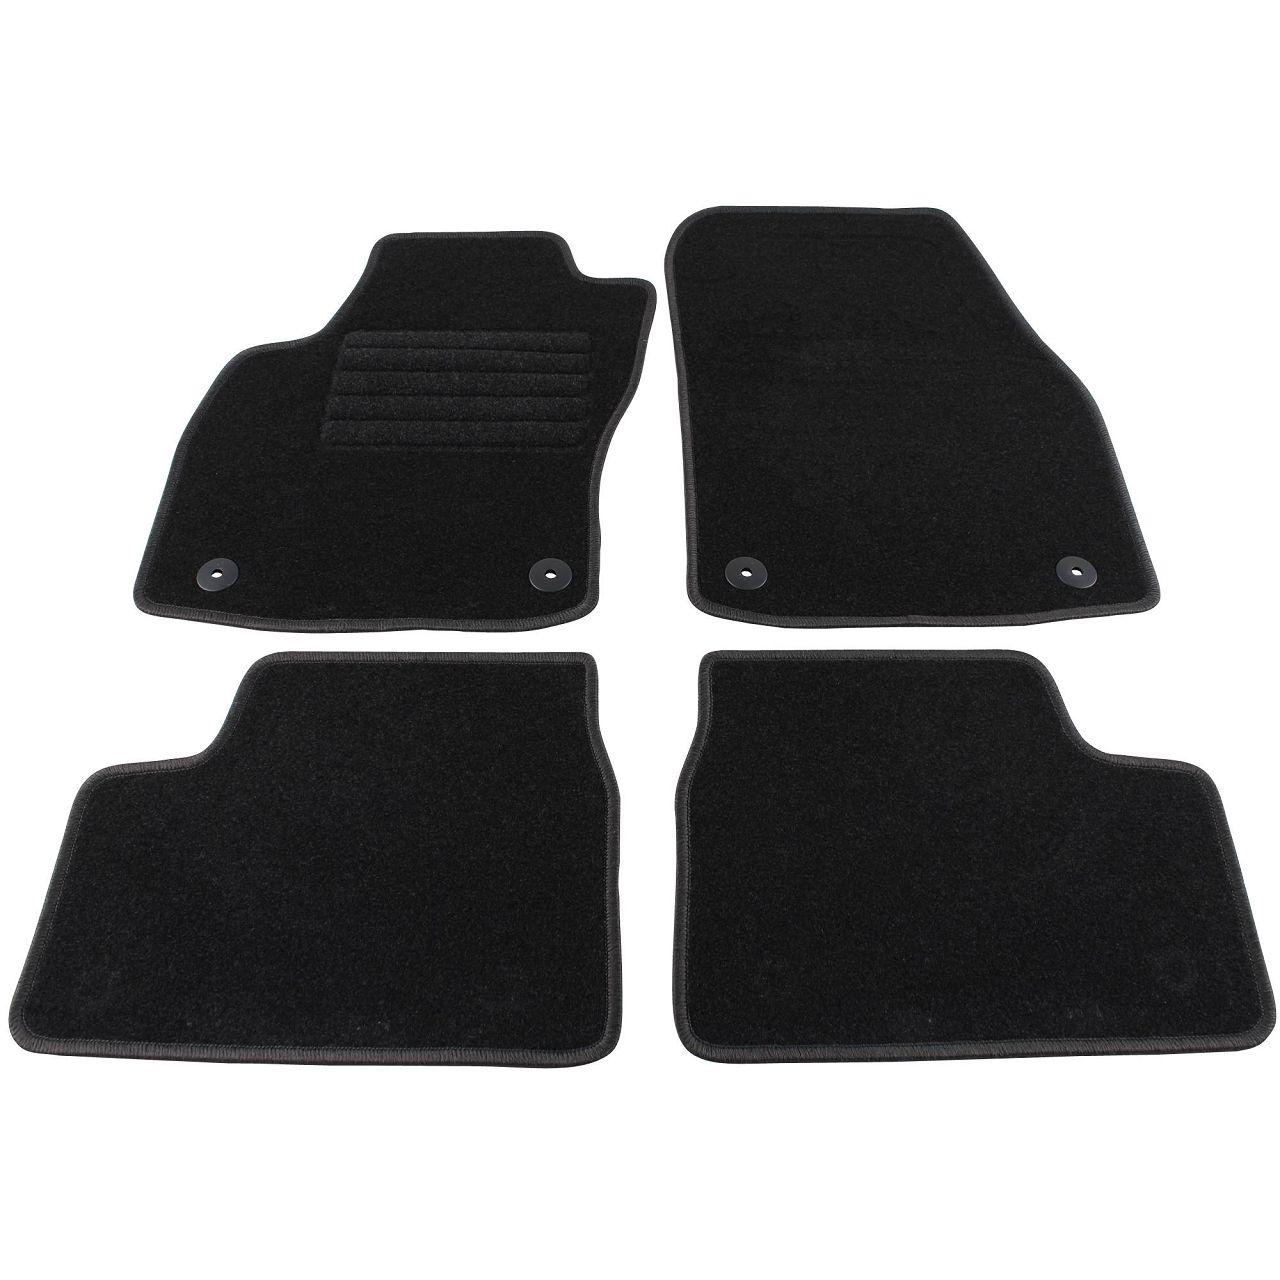 Veloursmatten Textilmatten Fußmatten für OPEL ASTRA H + CARAVAN + GTC + TWINTOP